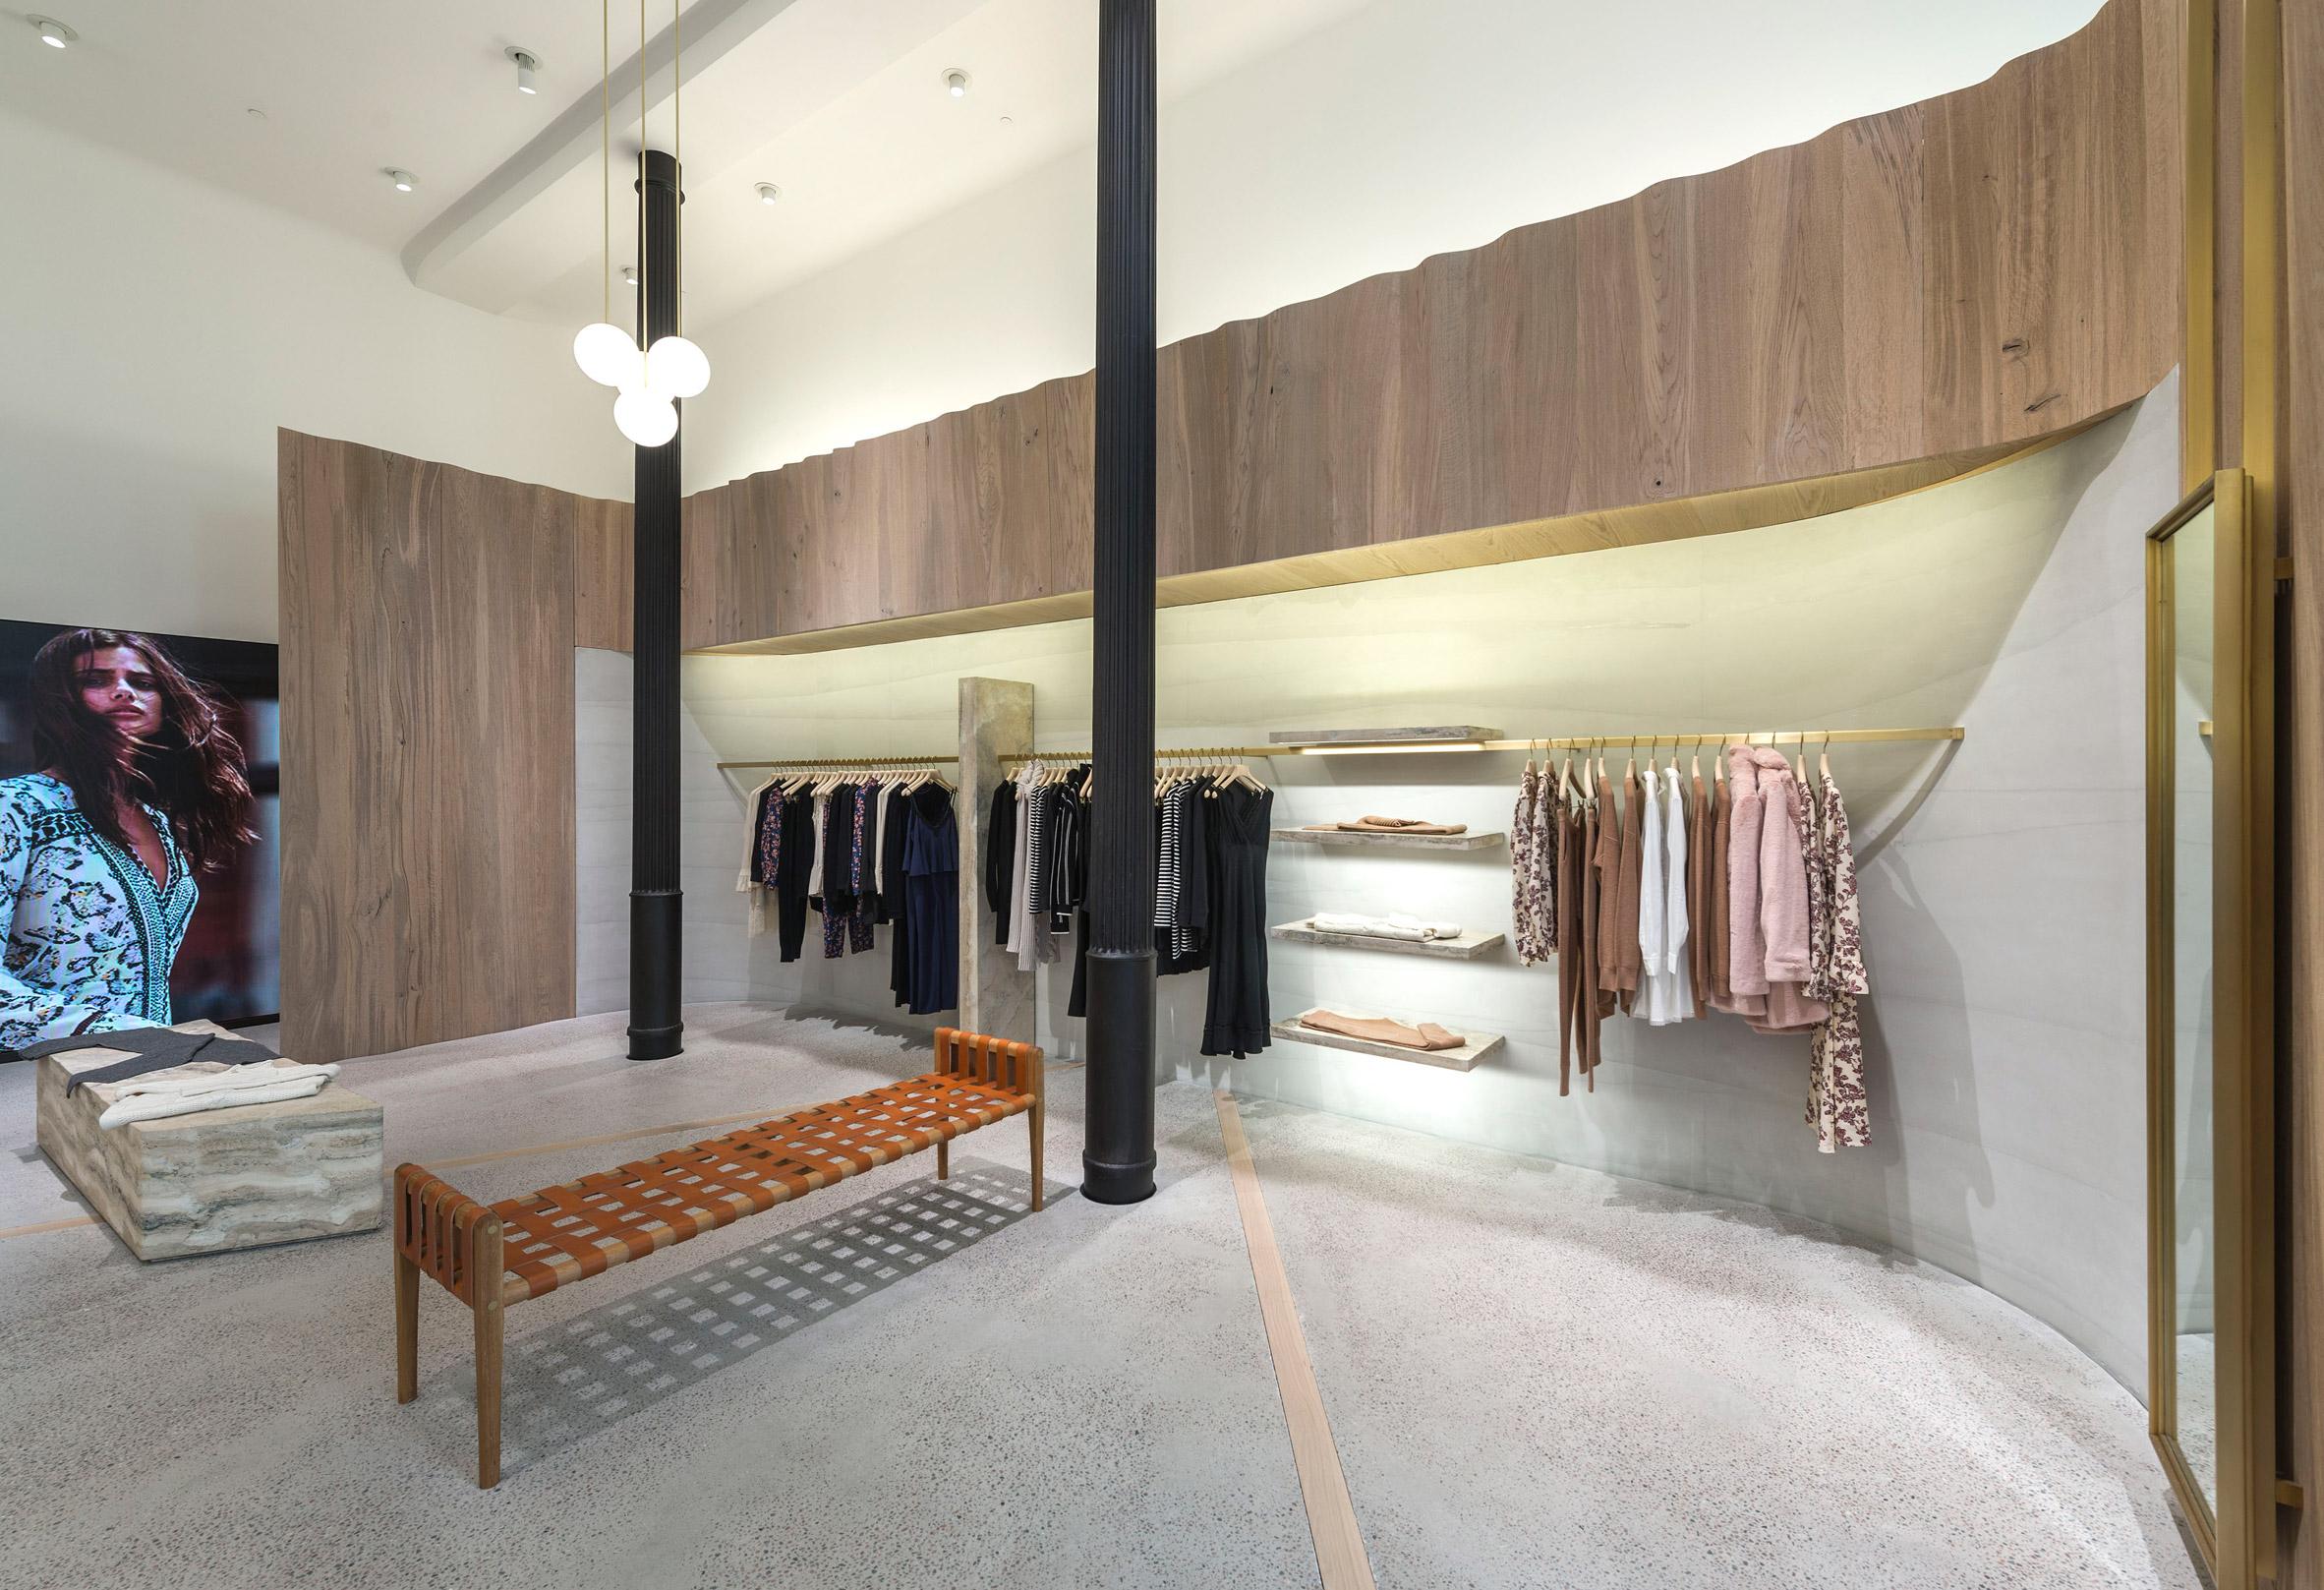 thakoon-ny-avra-madison-fashion-retail-store-shop-interior-design-fernando-mastrangelo-new-york-city-usa_dezeen_2364_col_8